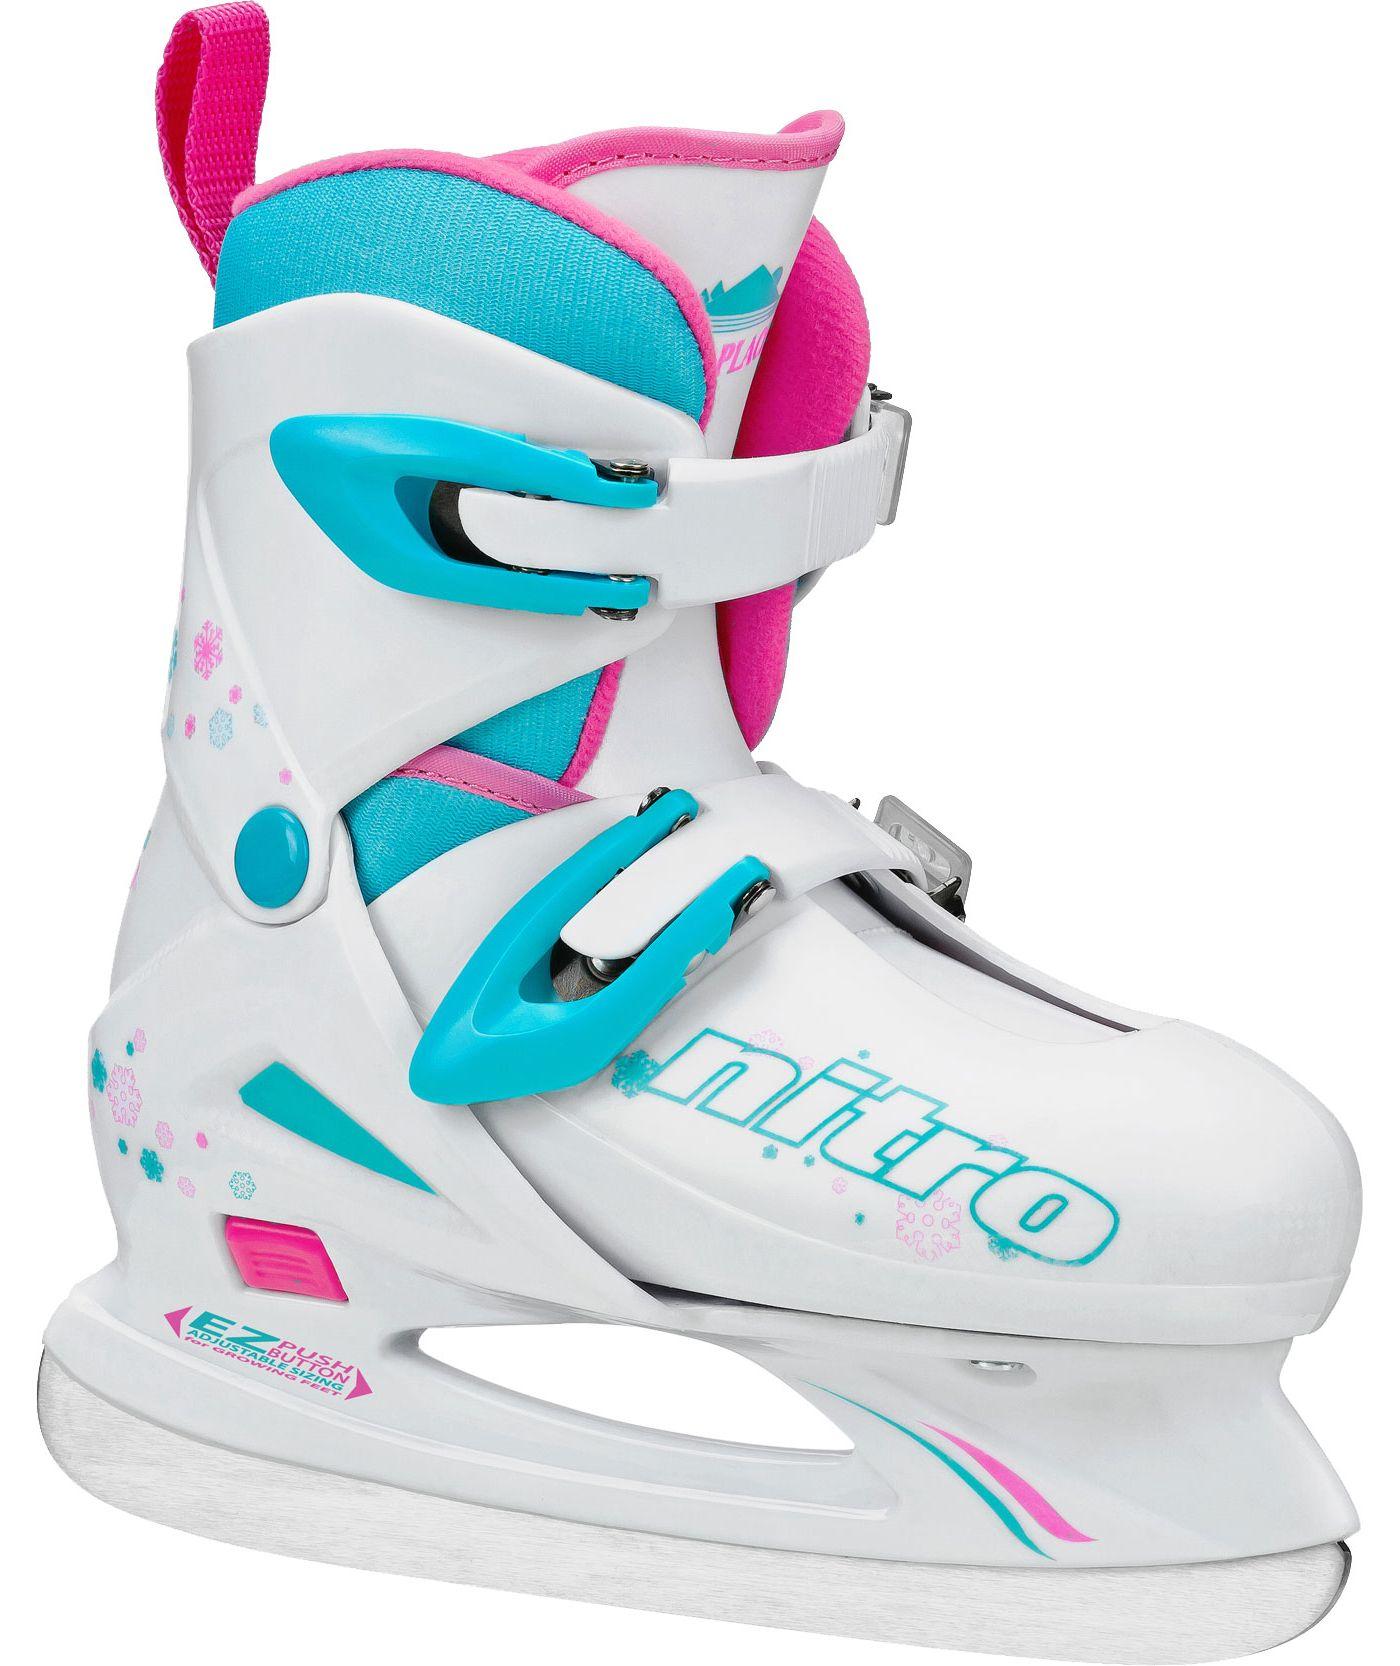 Lake Placid Girls' Nitro 8.8 Adjustable Figure Skates